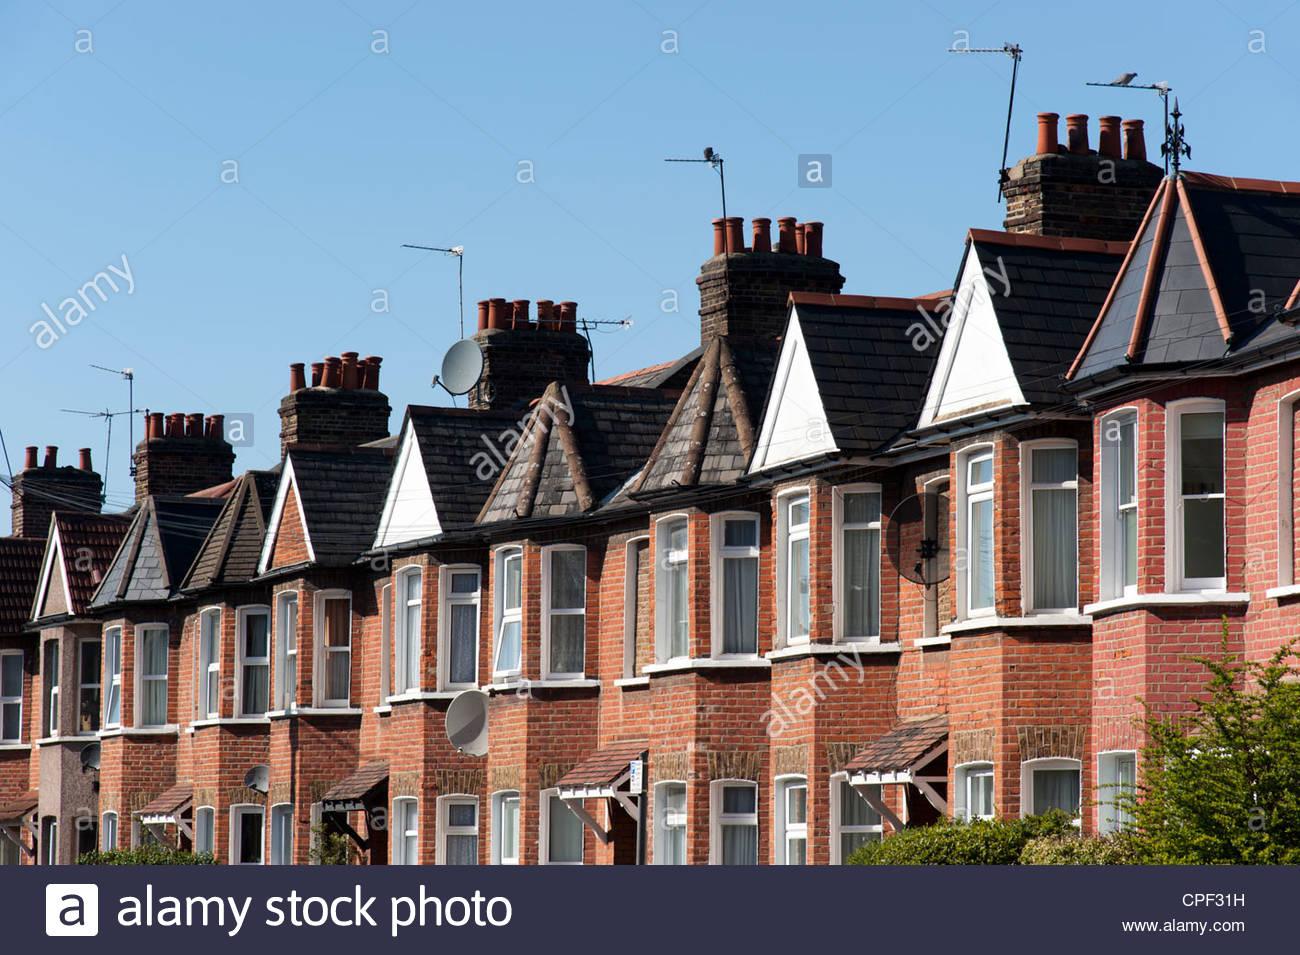 Row of terraced houses, Haringey, London, England, UK - Stock Image